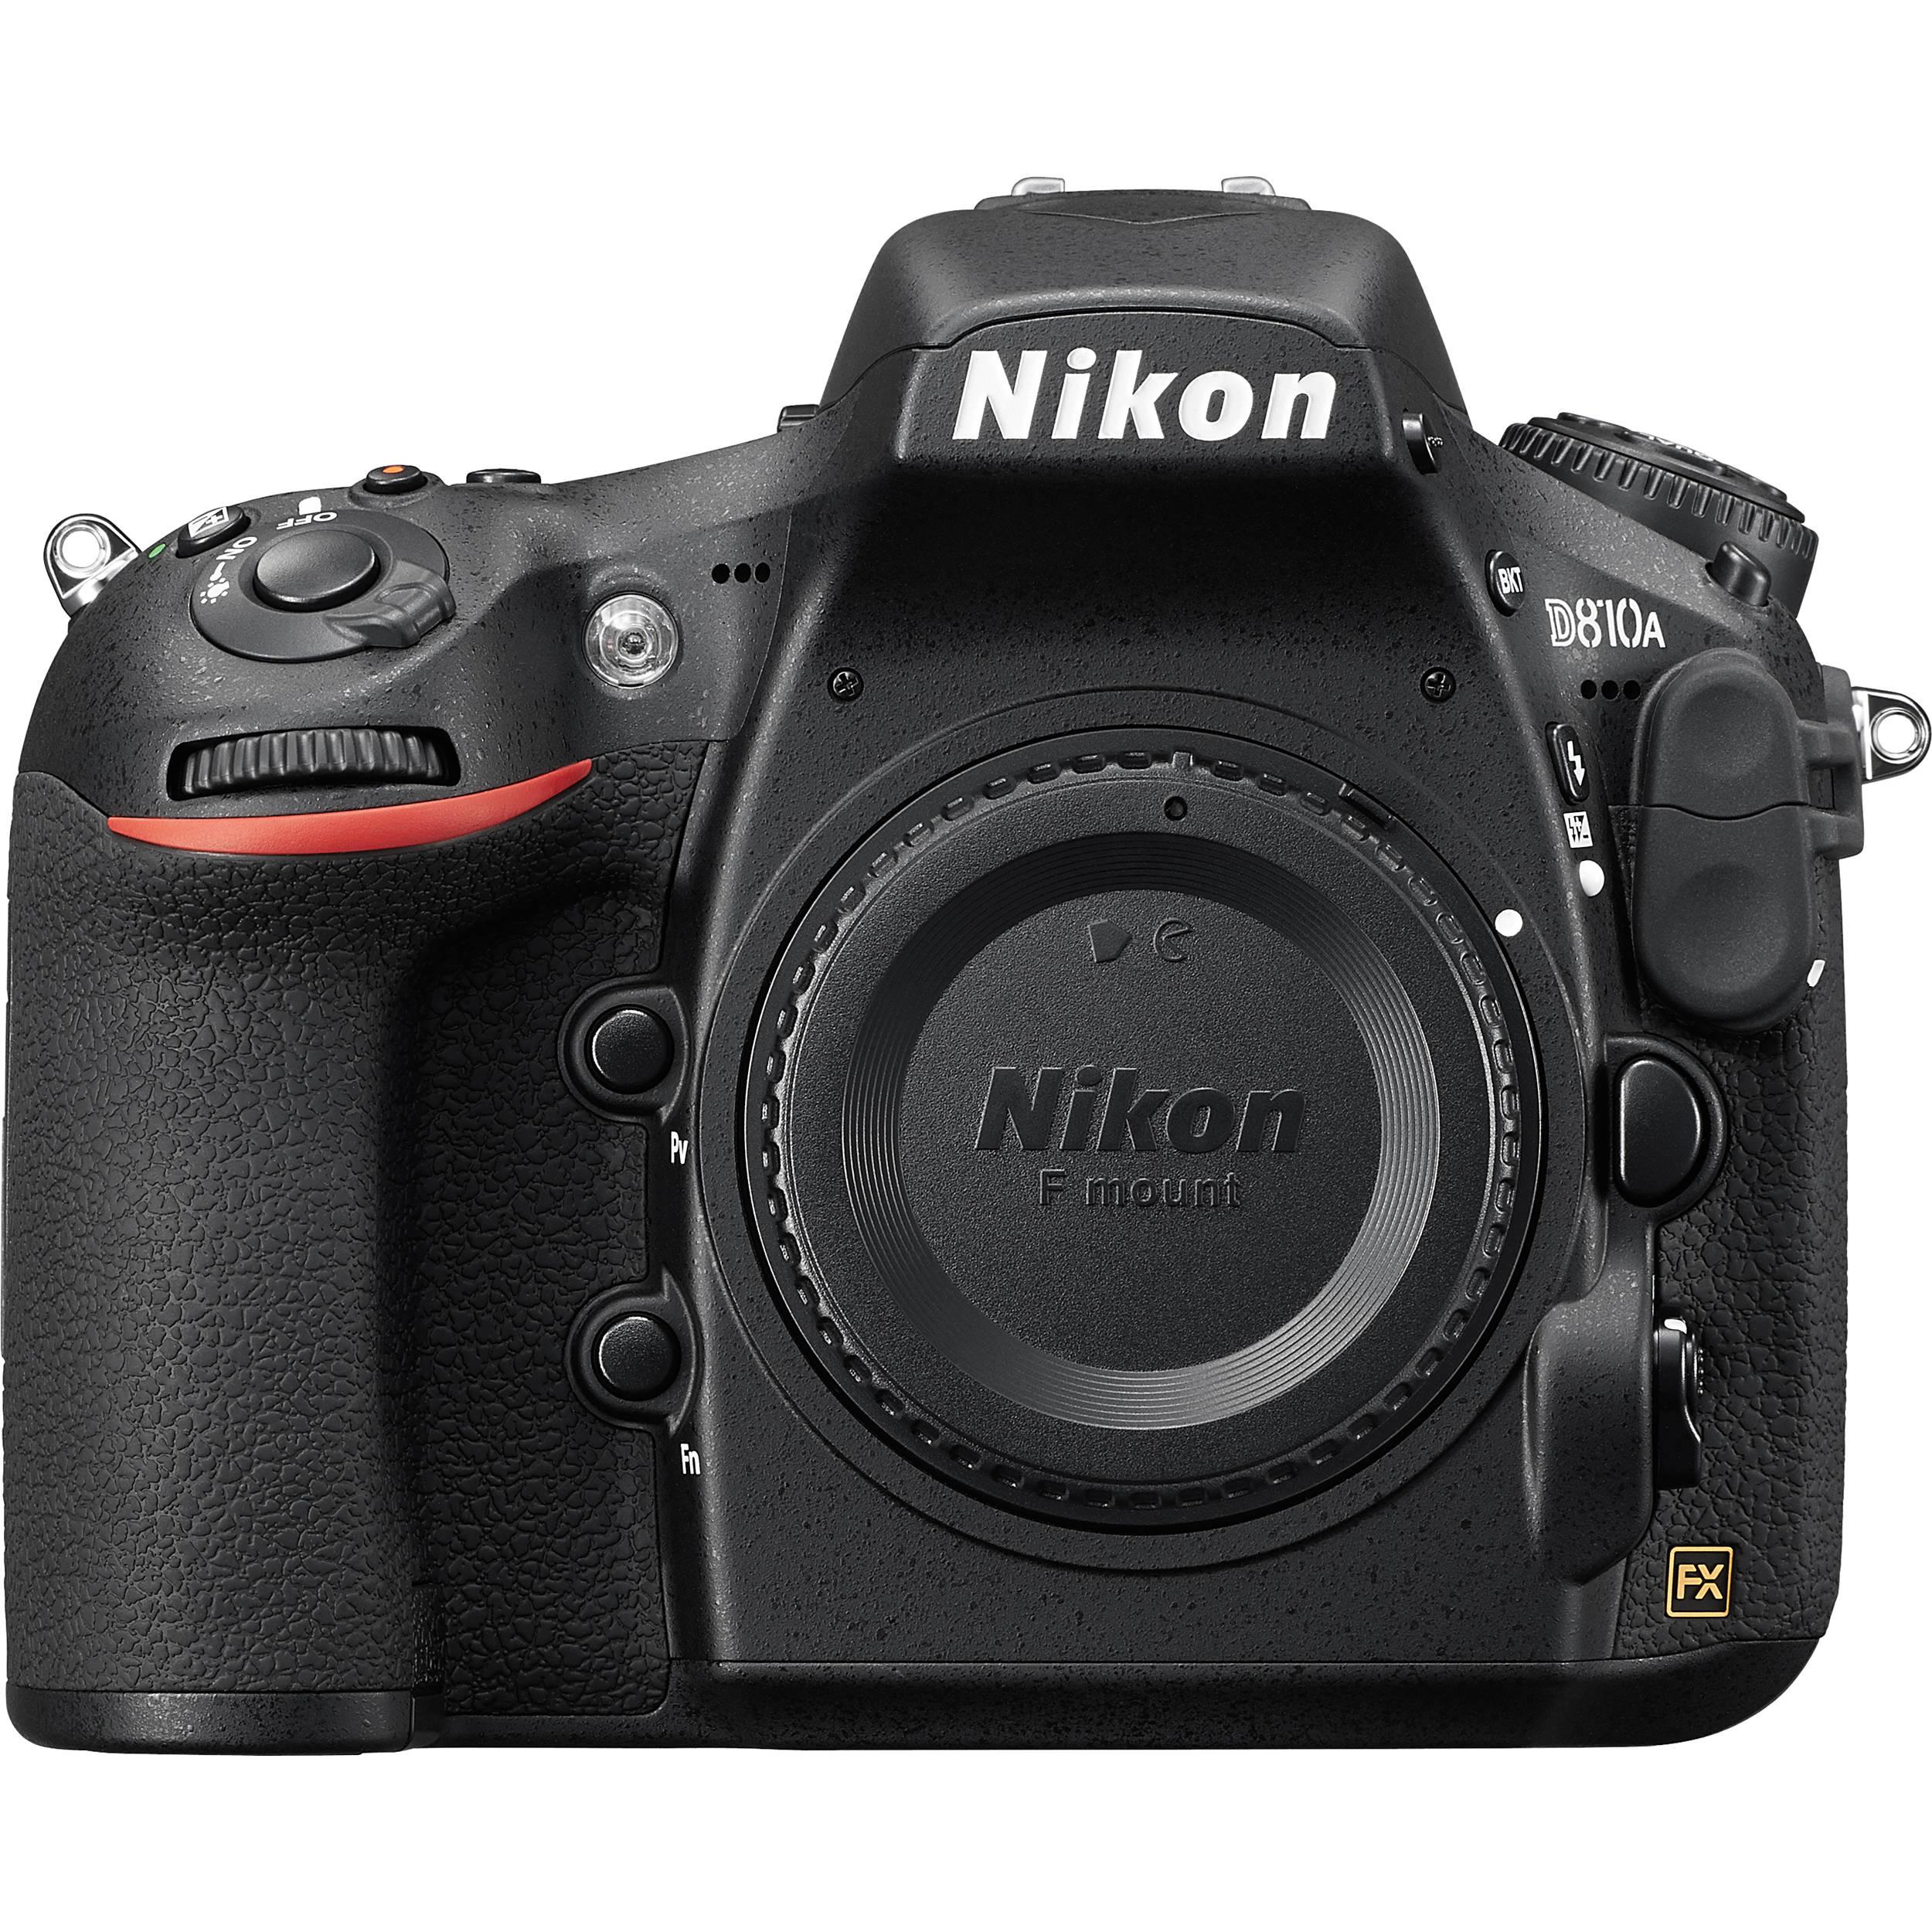 Nikon D810a Dslr Camera Body Only 1553 Bh Photo Video Garmin 8000 Wiring Diagram